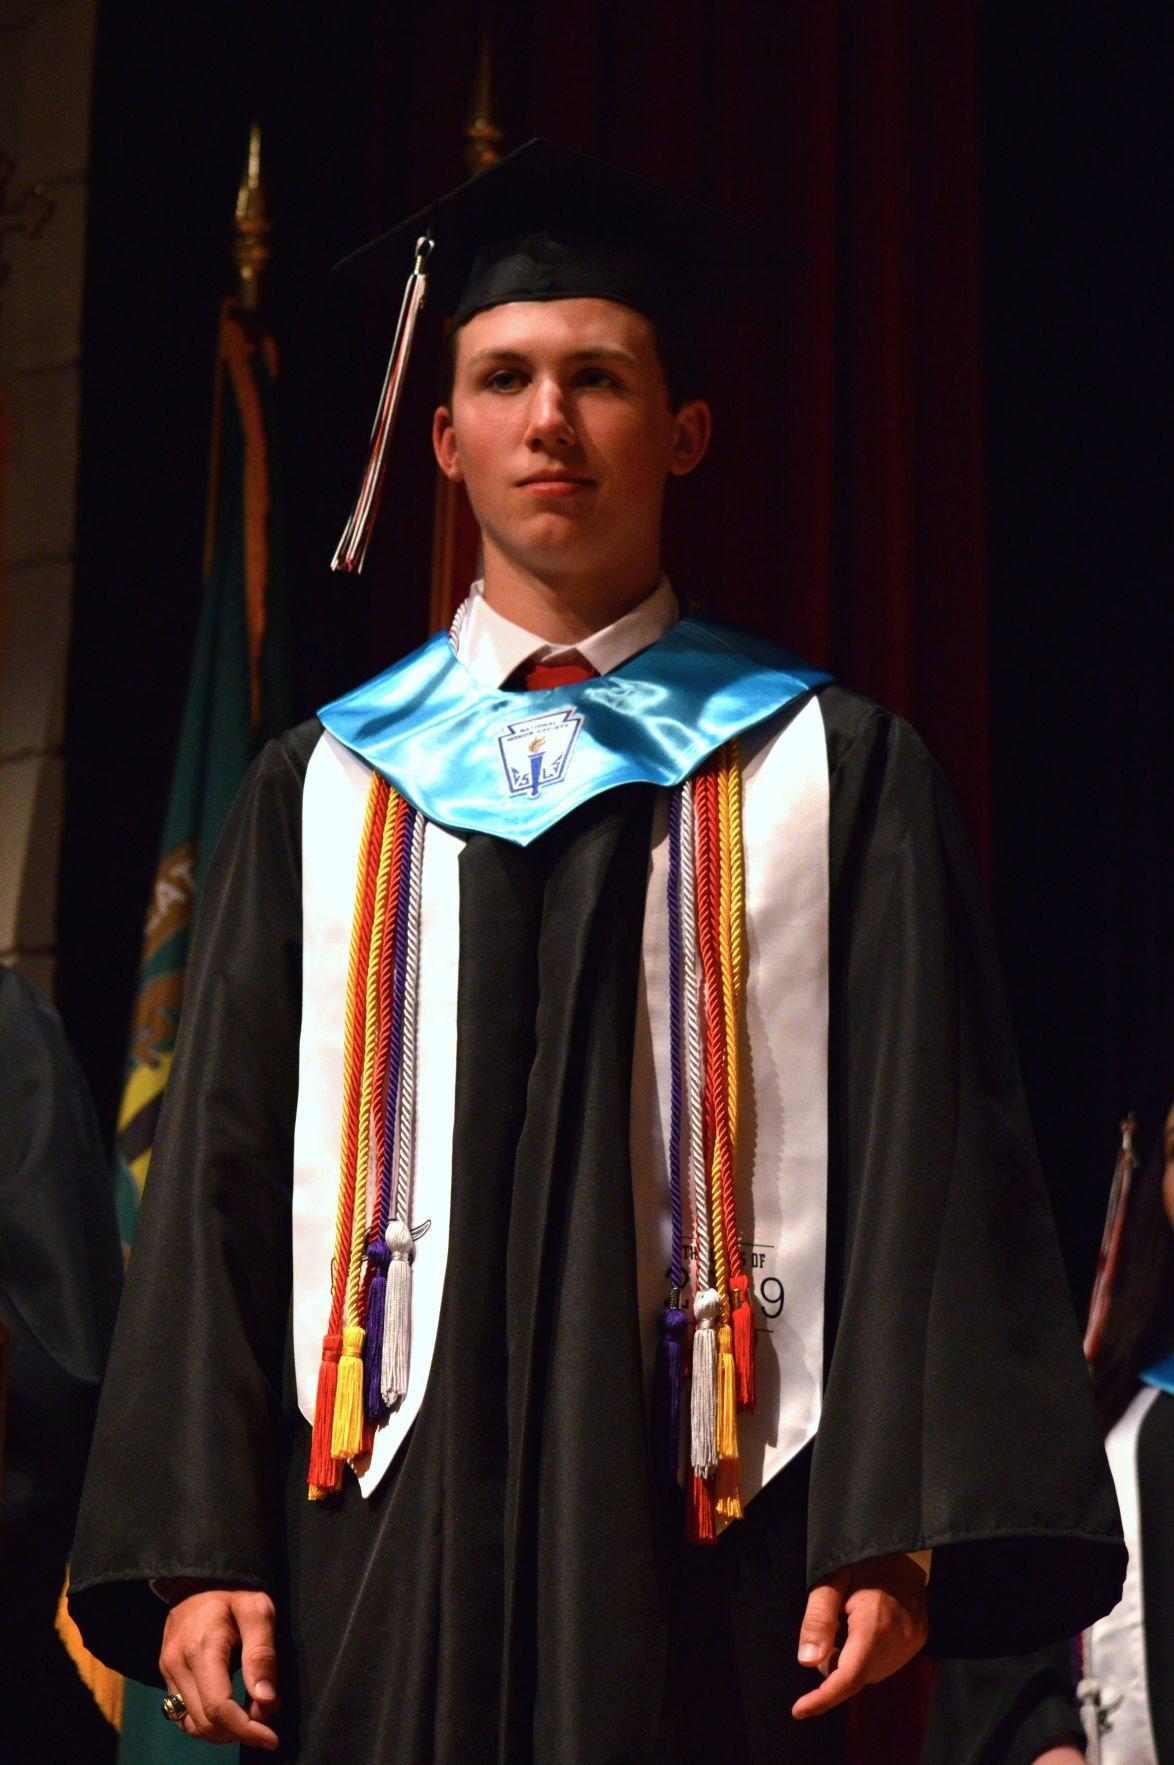 Colonel Richardson High School Class of 2019